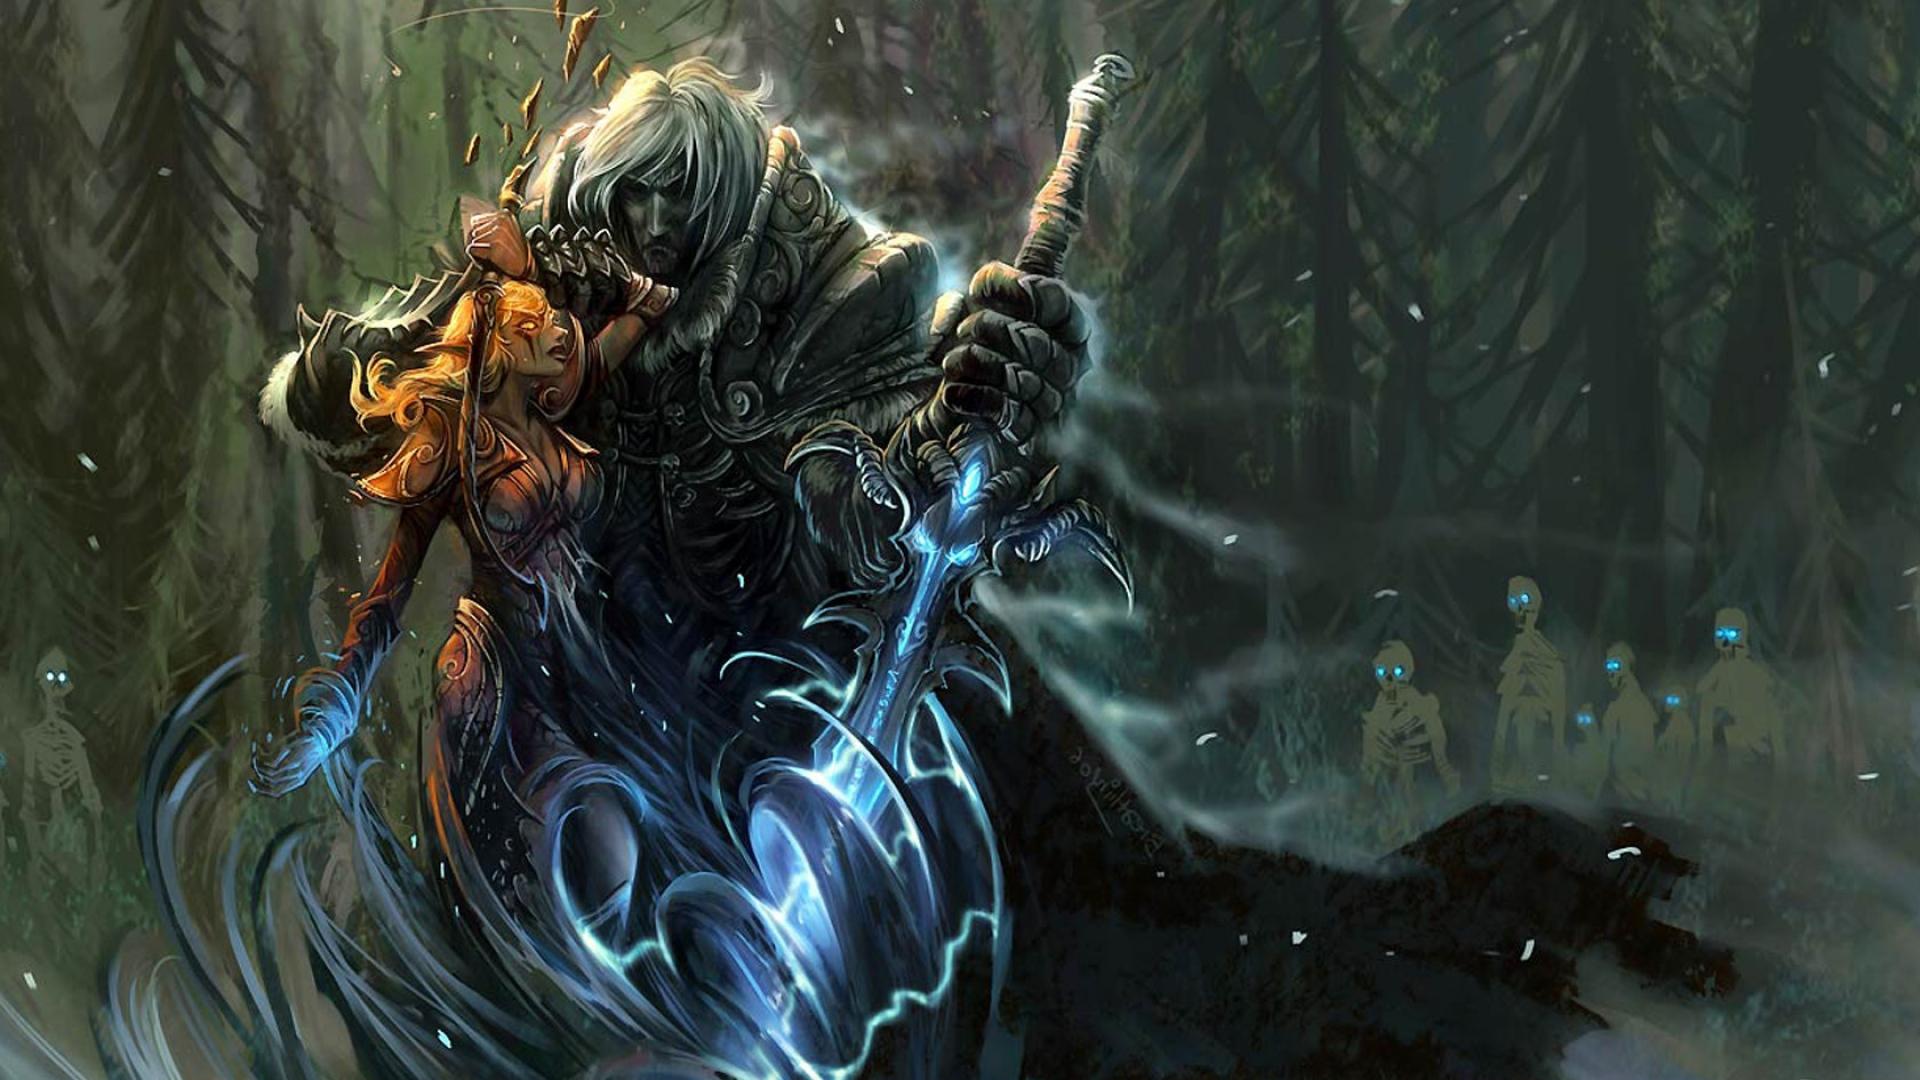 Download Wallpaper 1920x1080 World Of Warcraft Arthas Sword